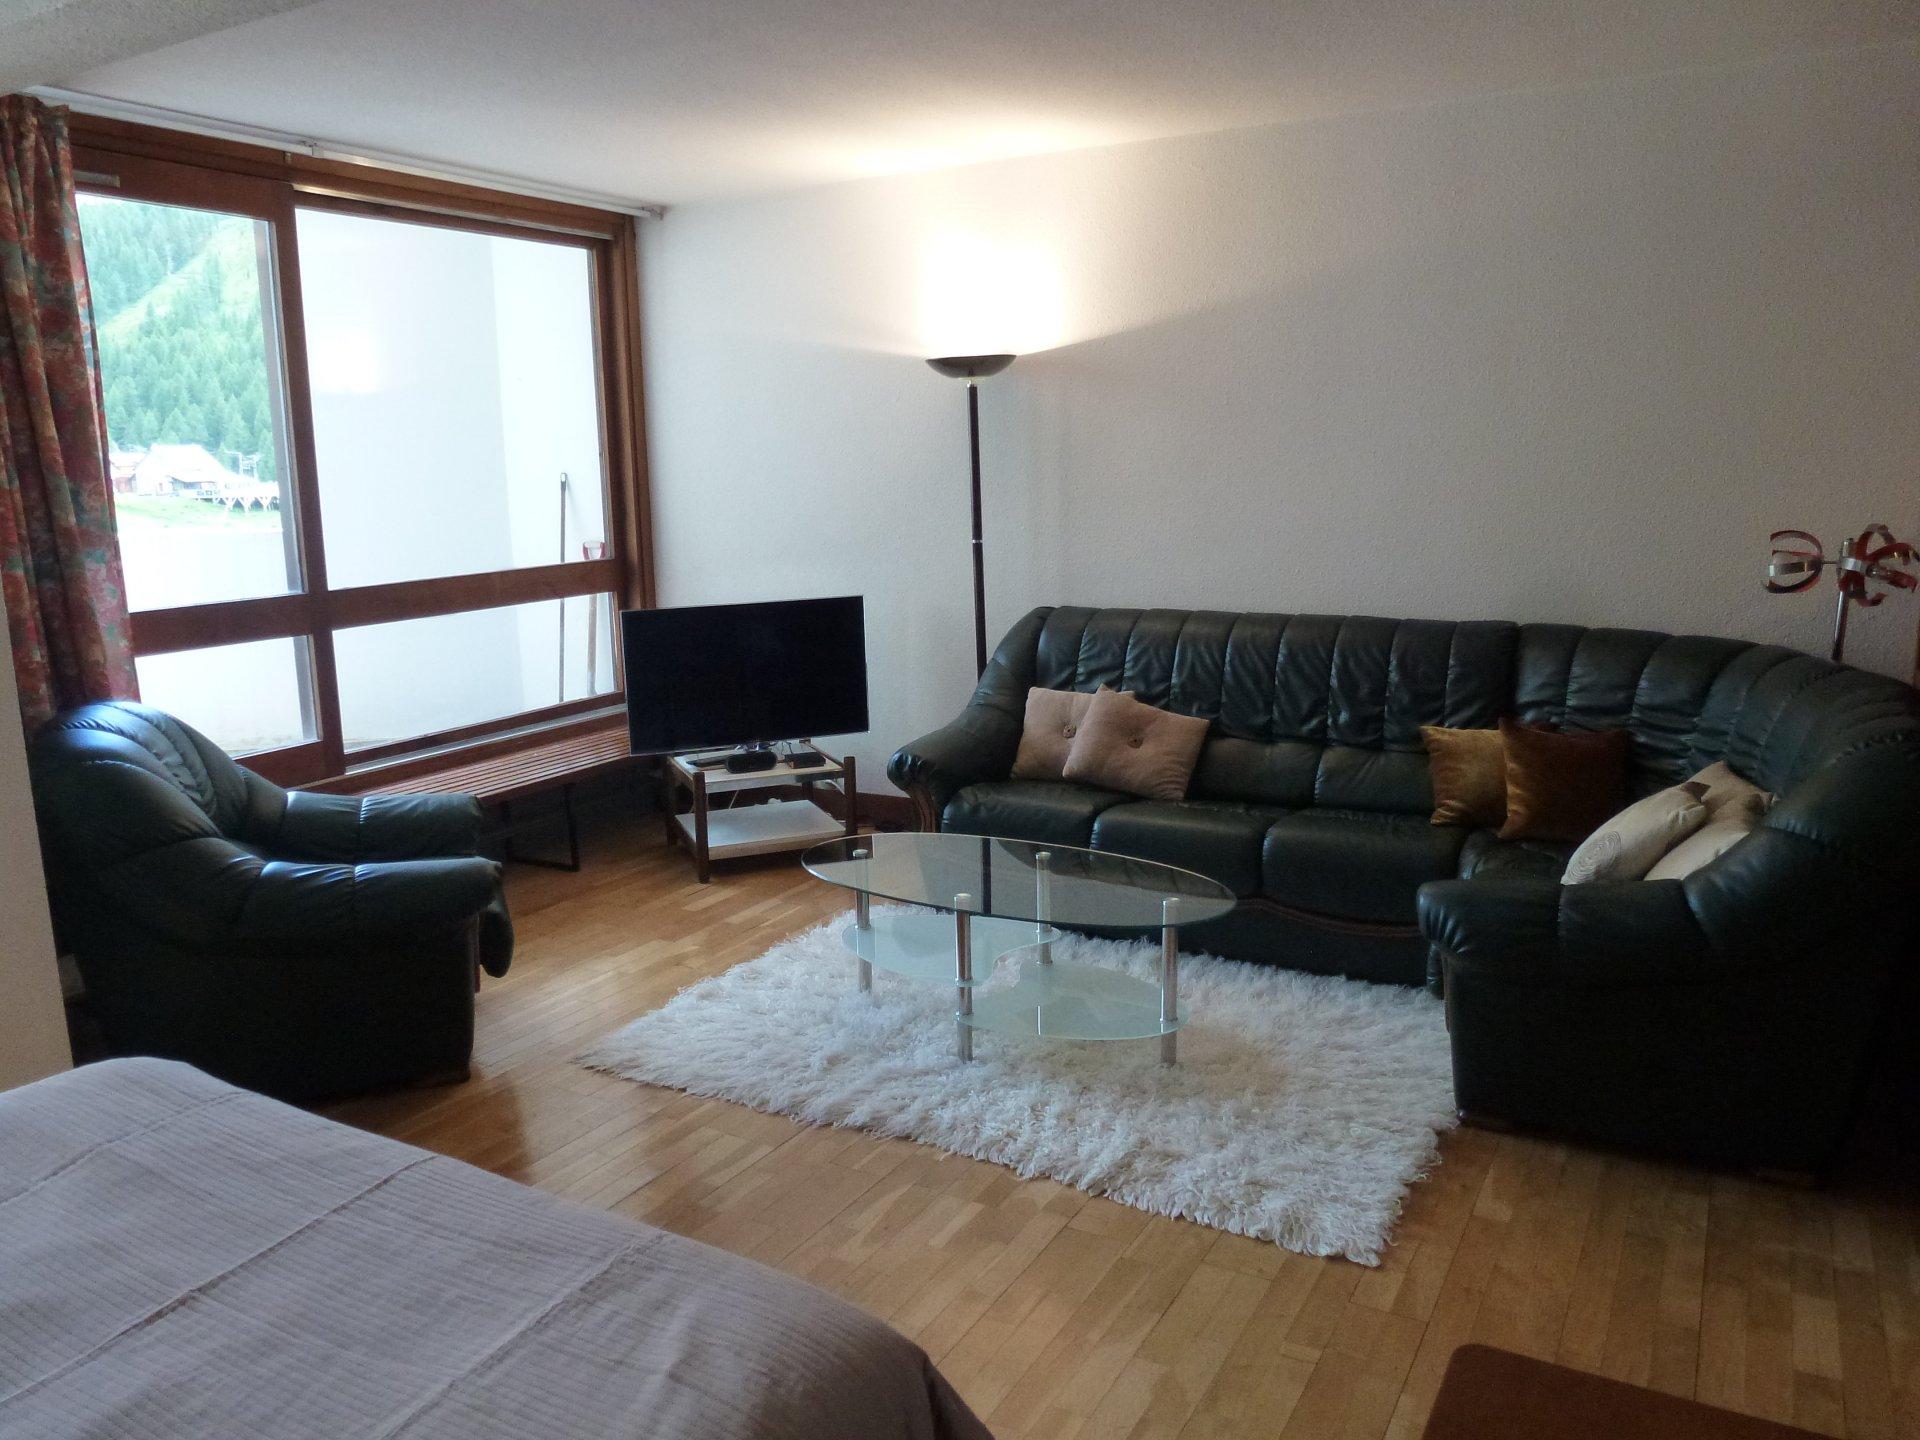 Seasonal rental Apartment - Isola 2000 Front de neige